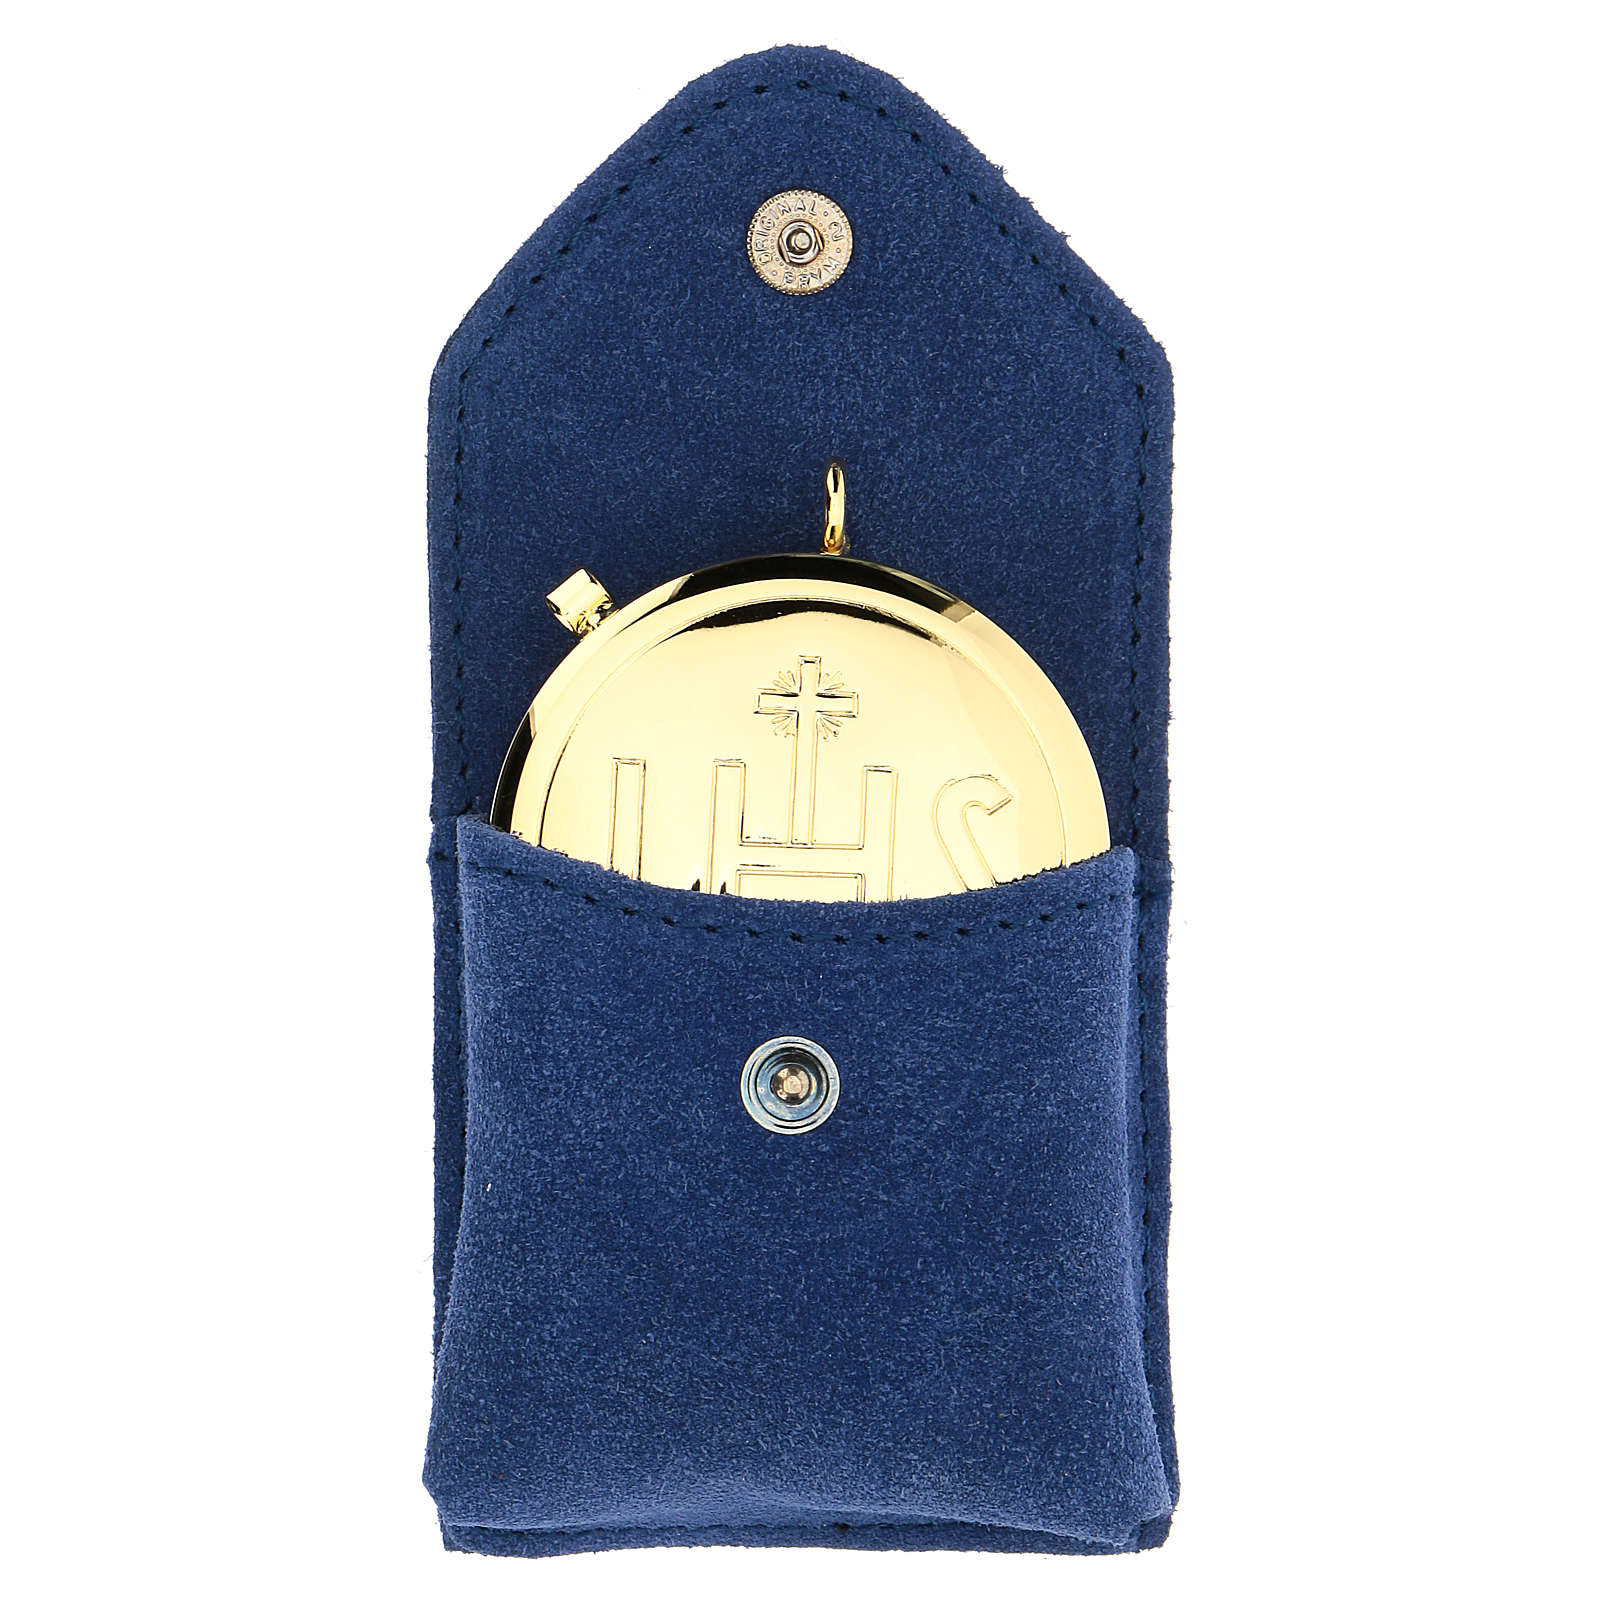 Astuccio portateca camoscio blu teca oro IHS bottone 3